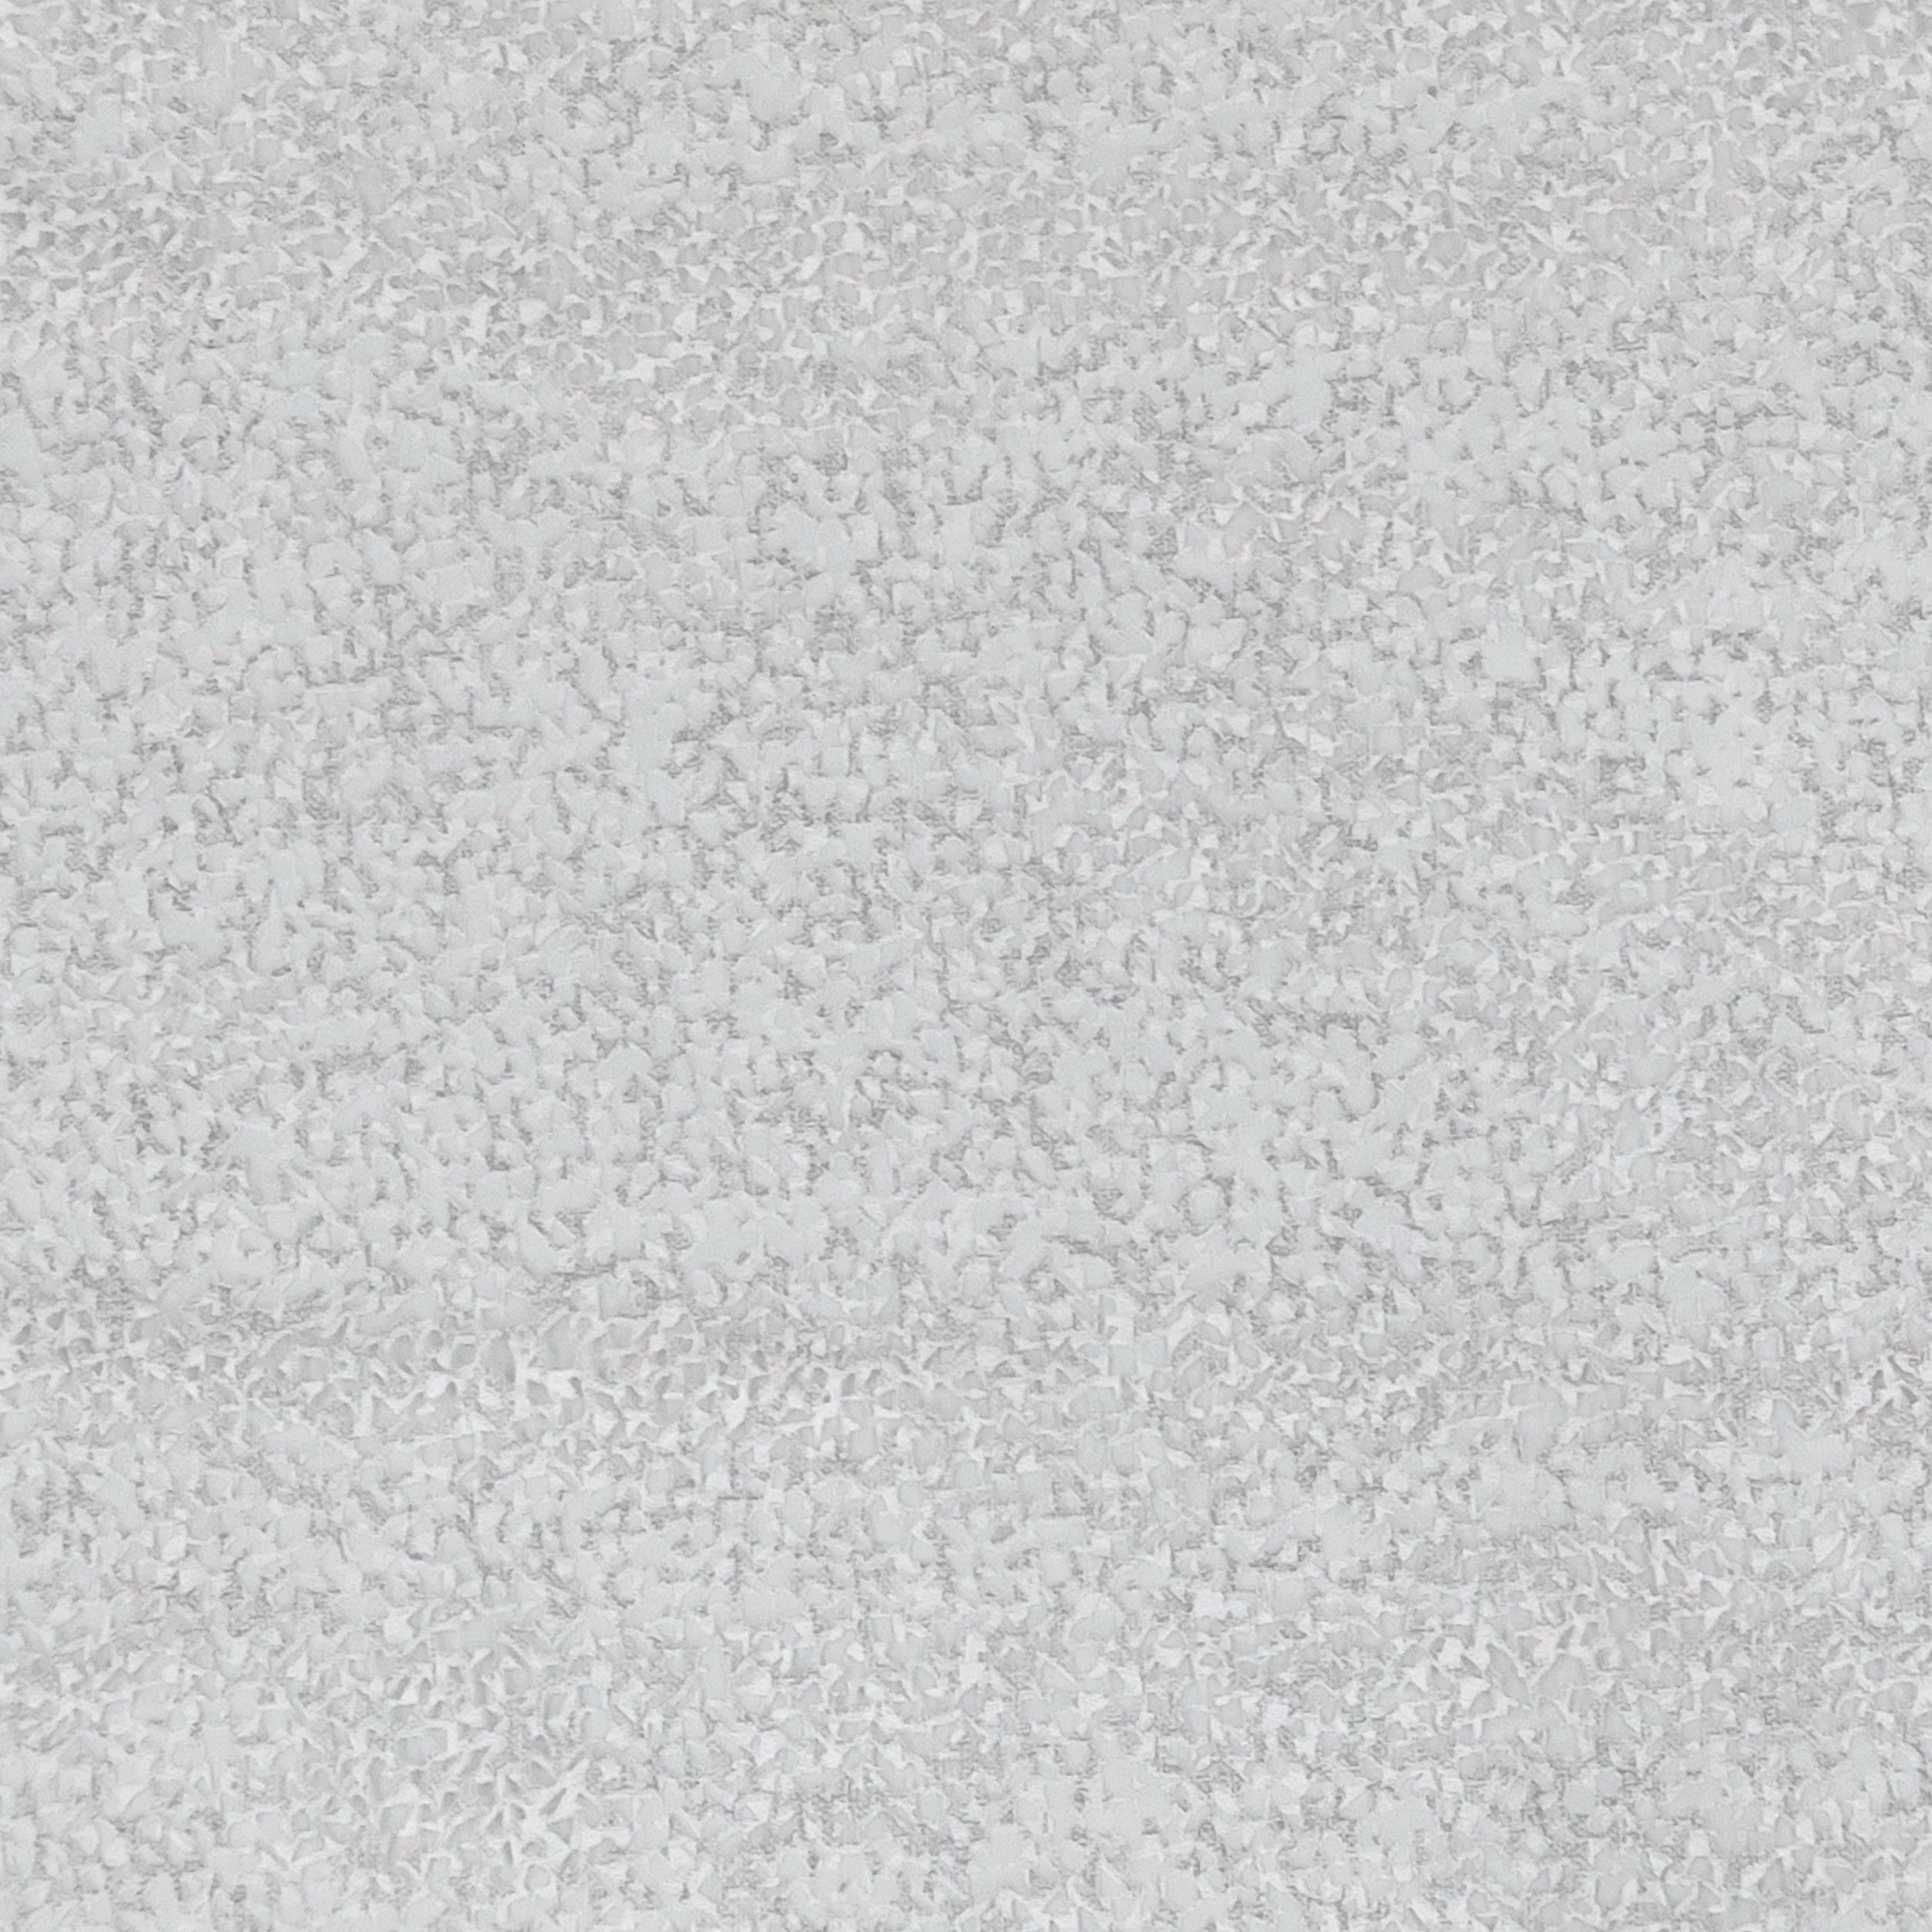 Tessuto Tendino Micro Fantasia Devorè Grigio